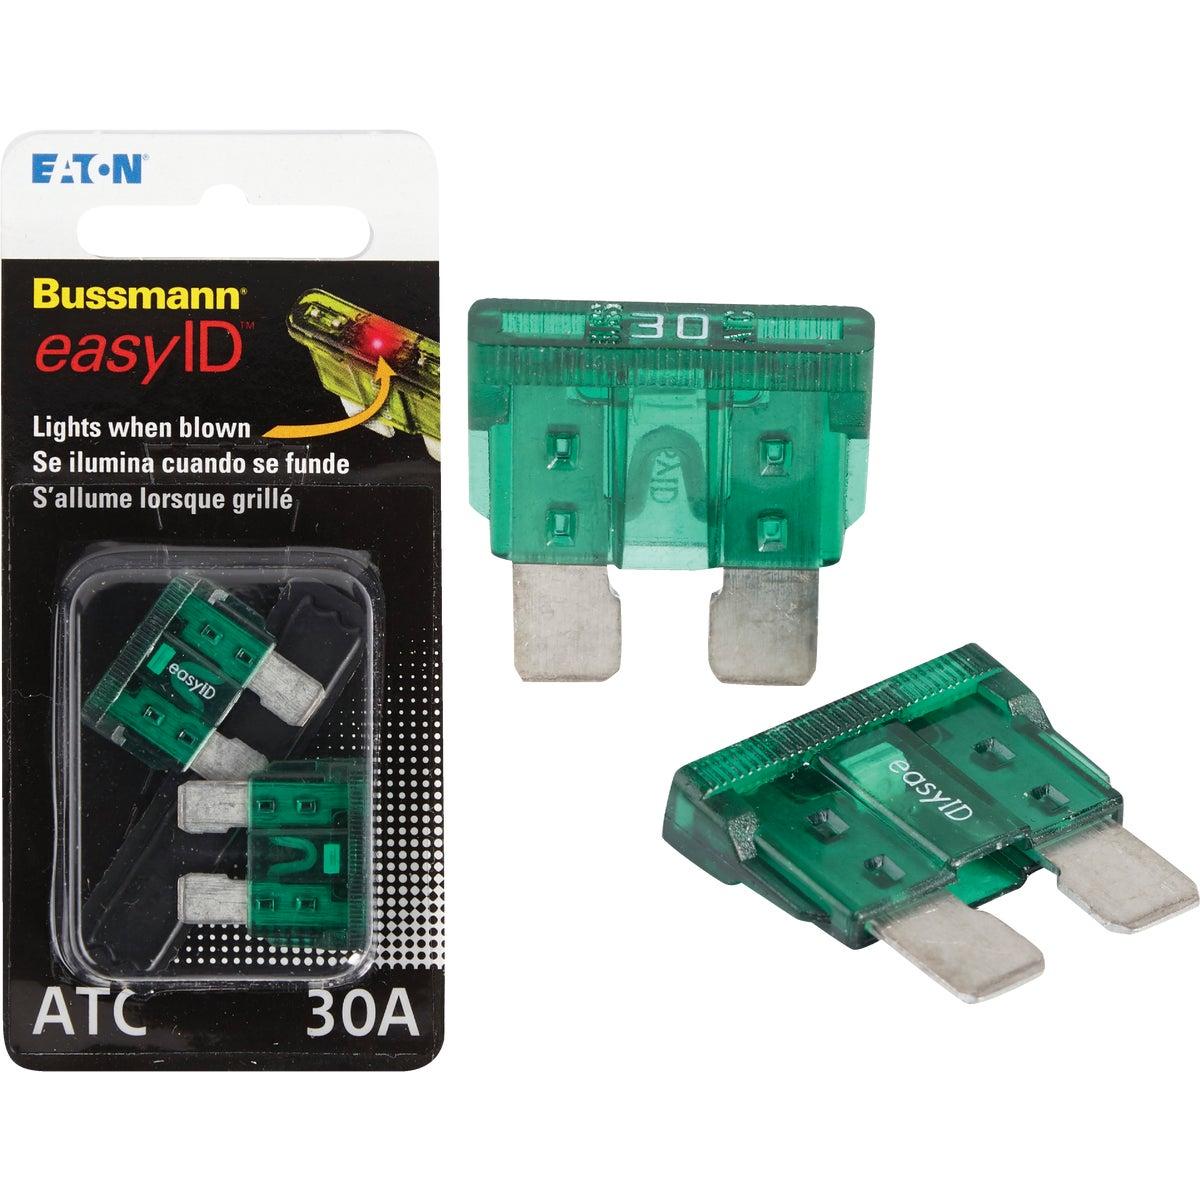 2PK 30A ATC EASY ID FUSE - BP/ATC-30ID by Bussmann Cooper